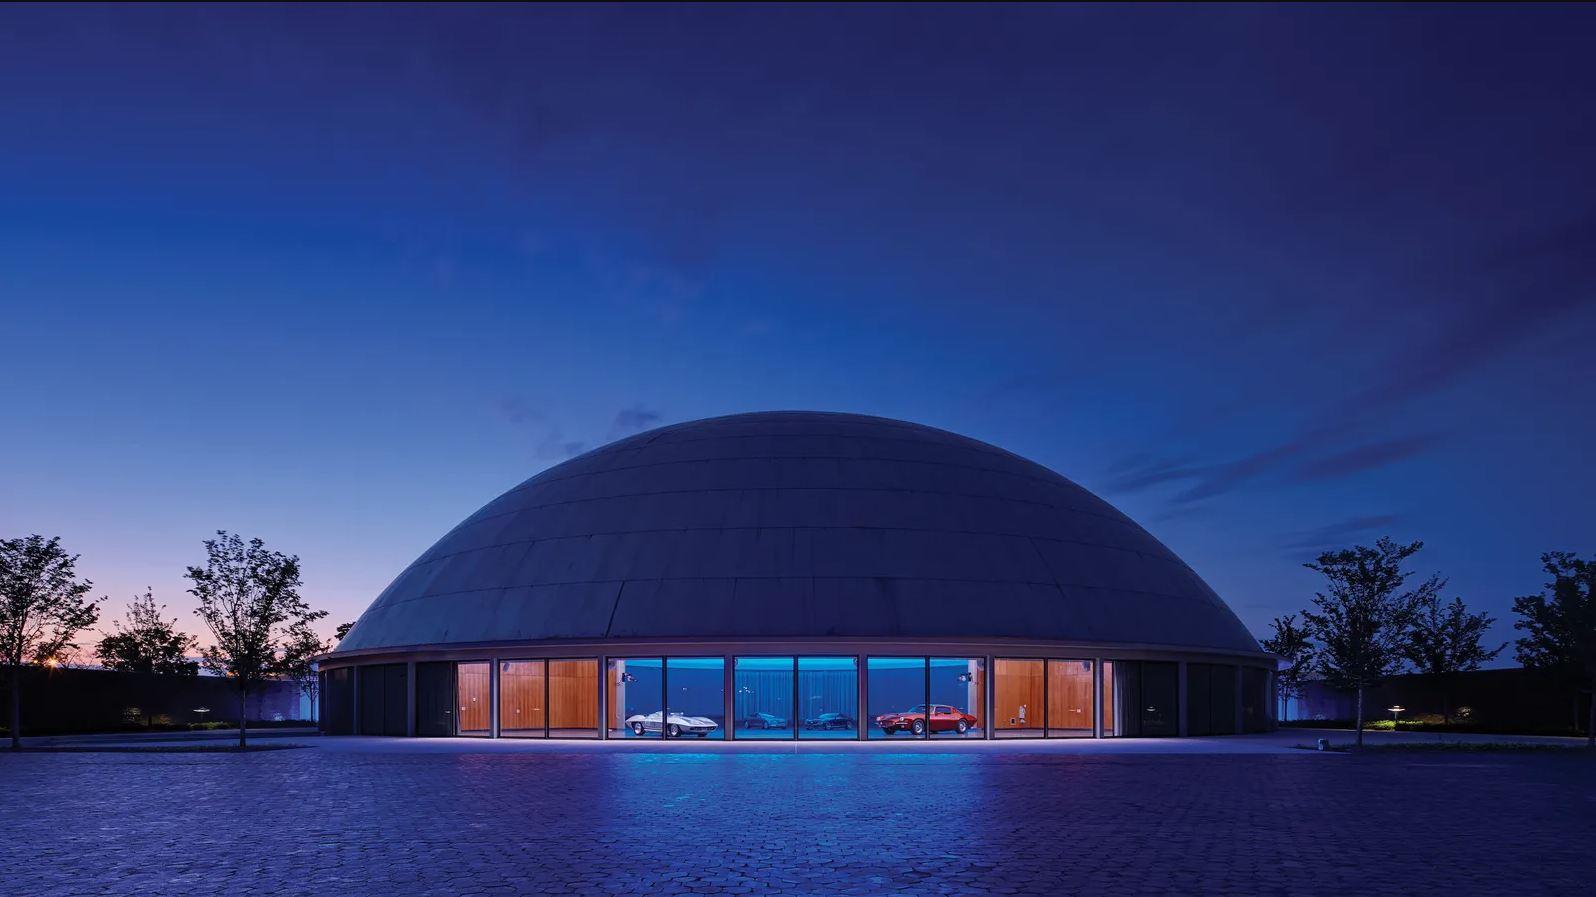 Michigan Modern: An Architectural Legacy